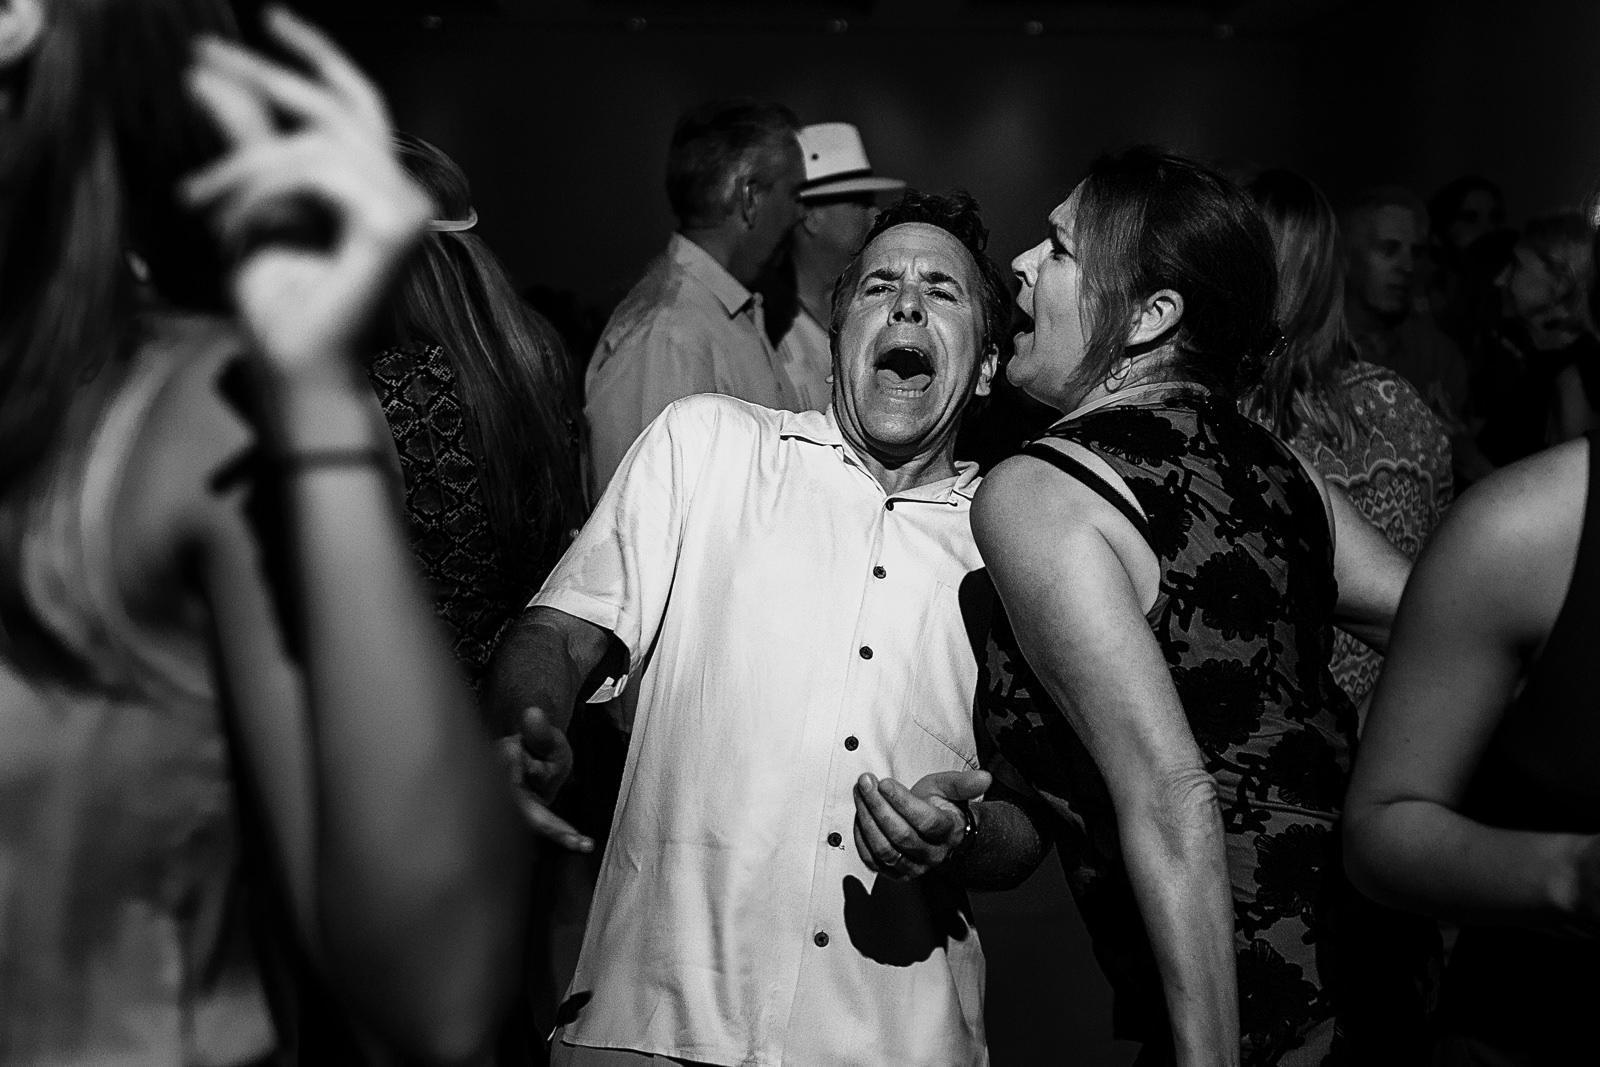 Guests singing at wedding reception - Eder Acevedo cancun los cabos vallarta wedding photographer